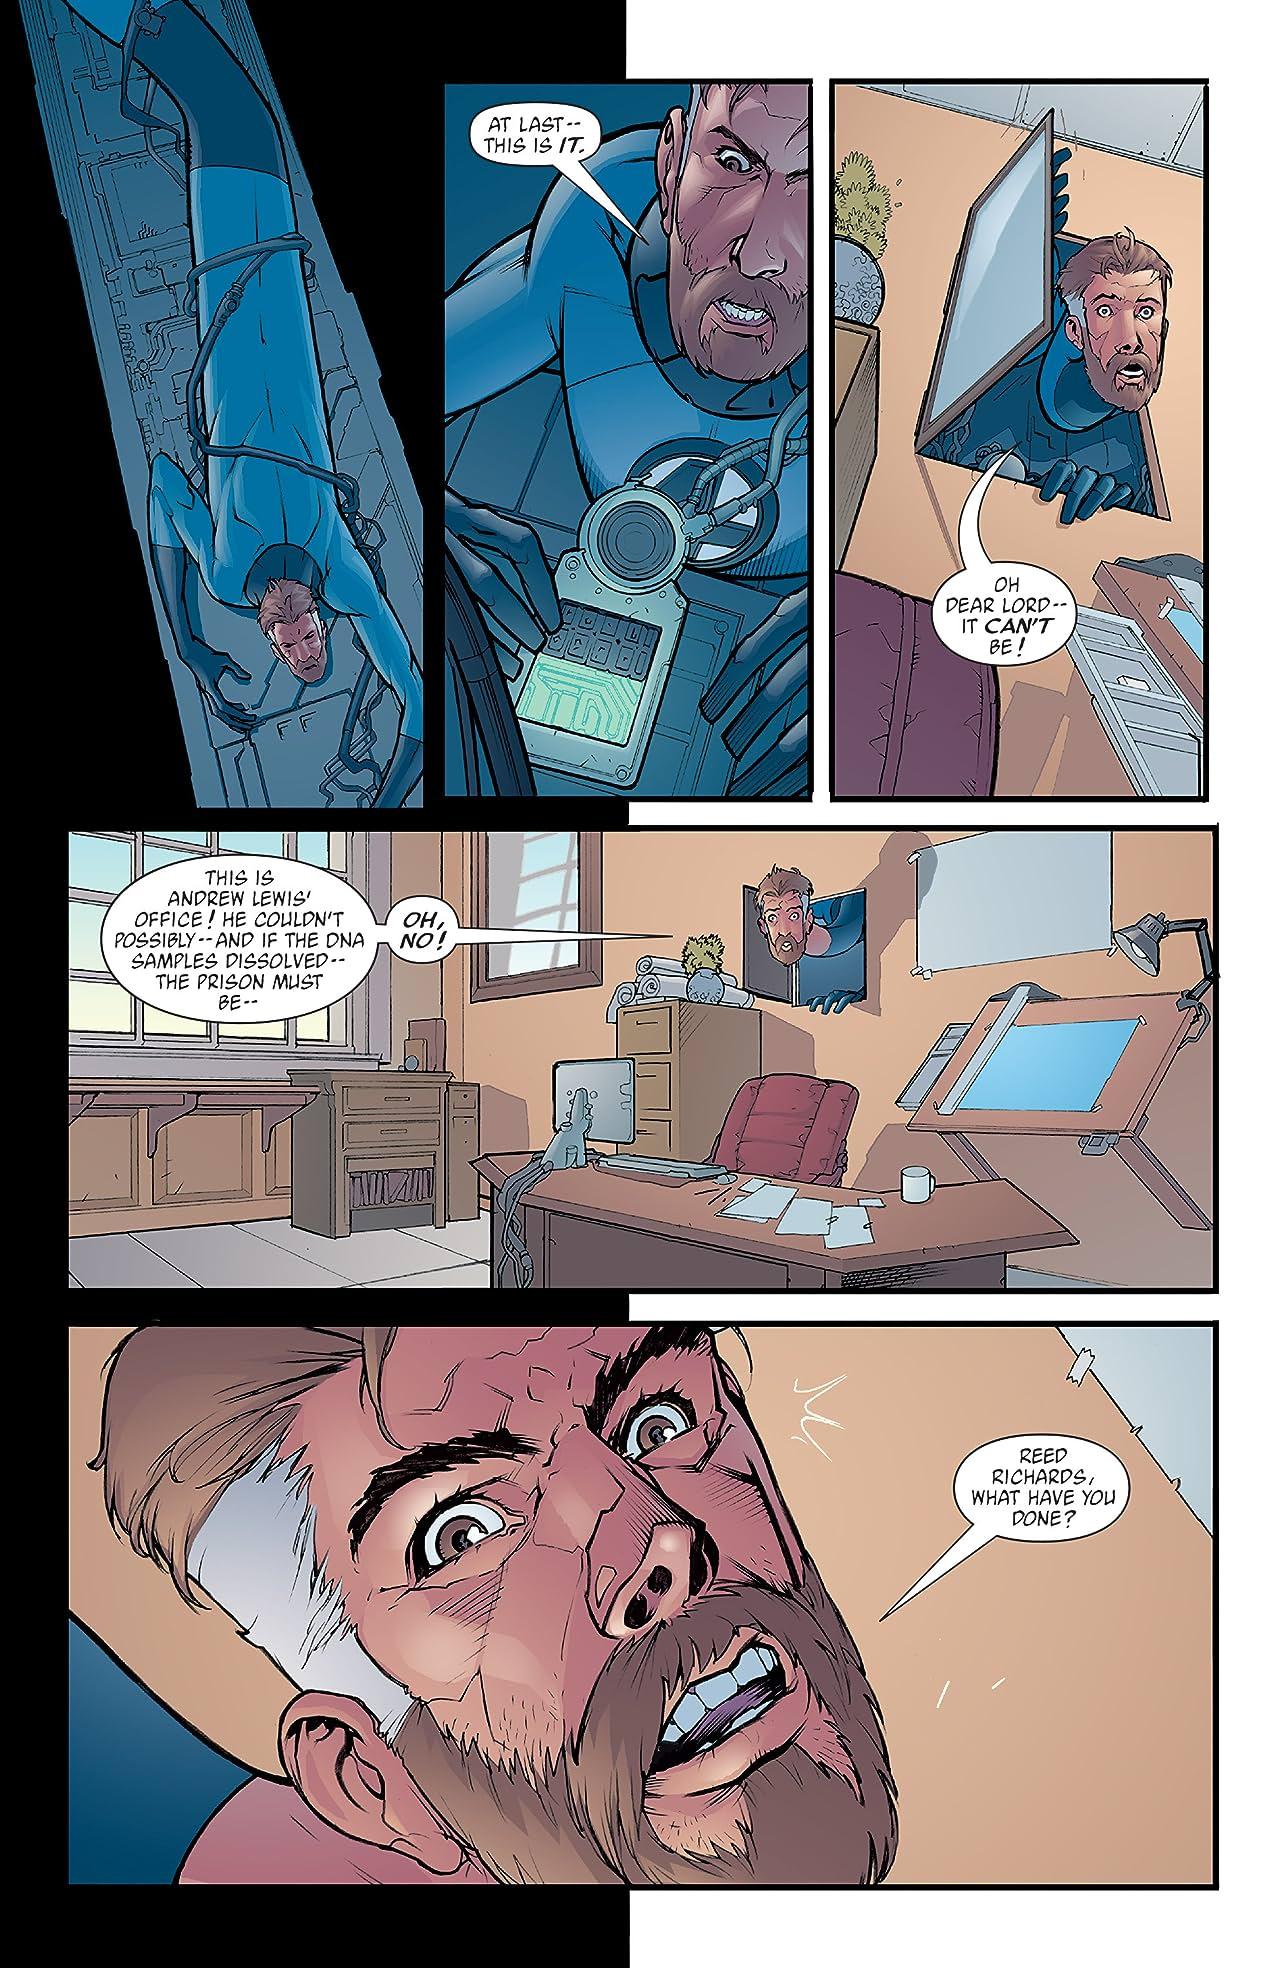 Fantastic Four: Foes (2005) #6 (of 6)